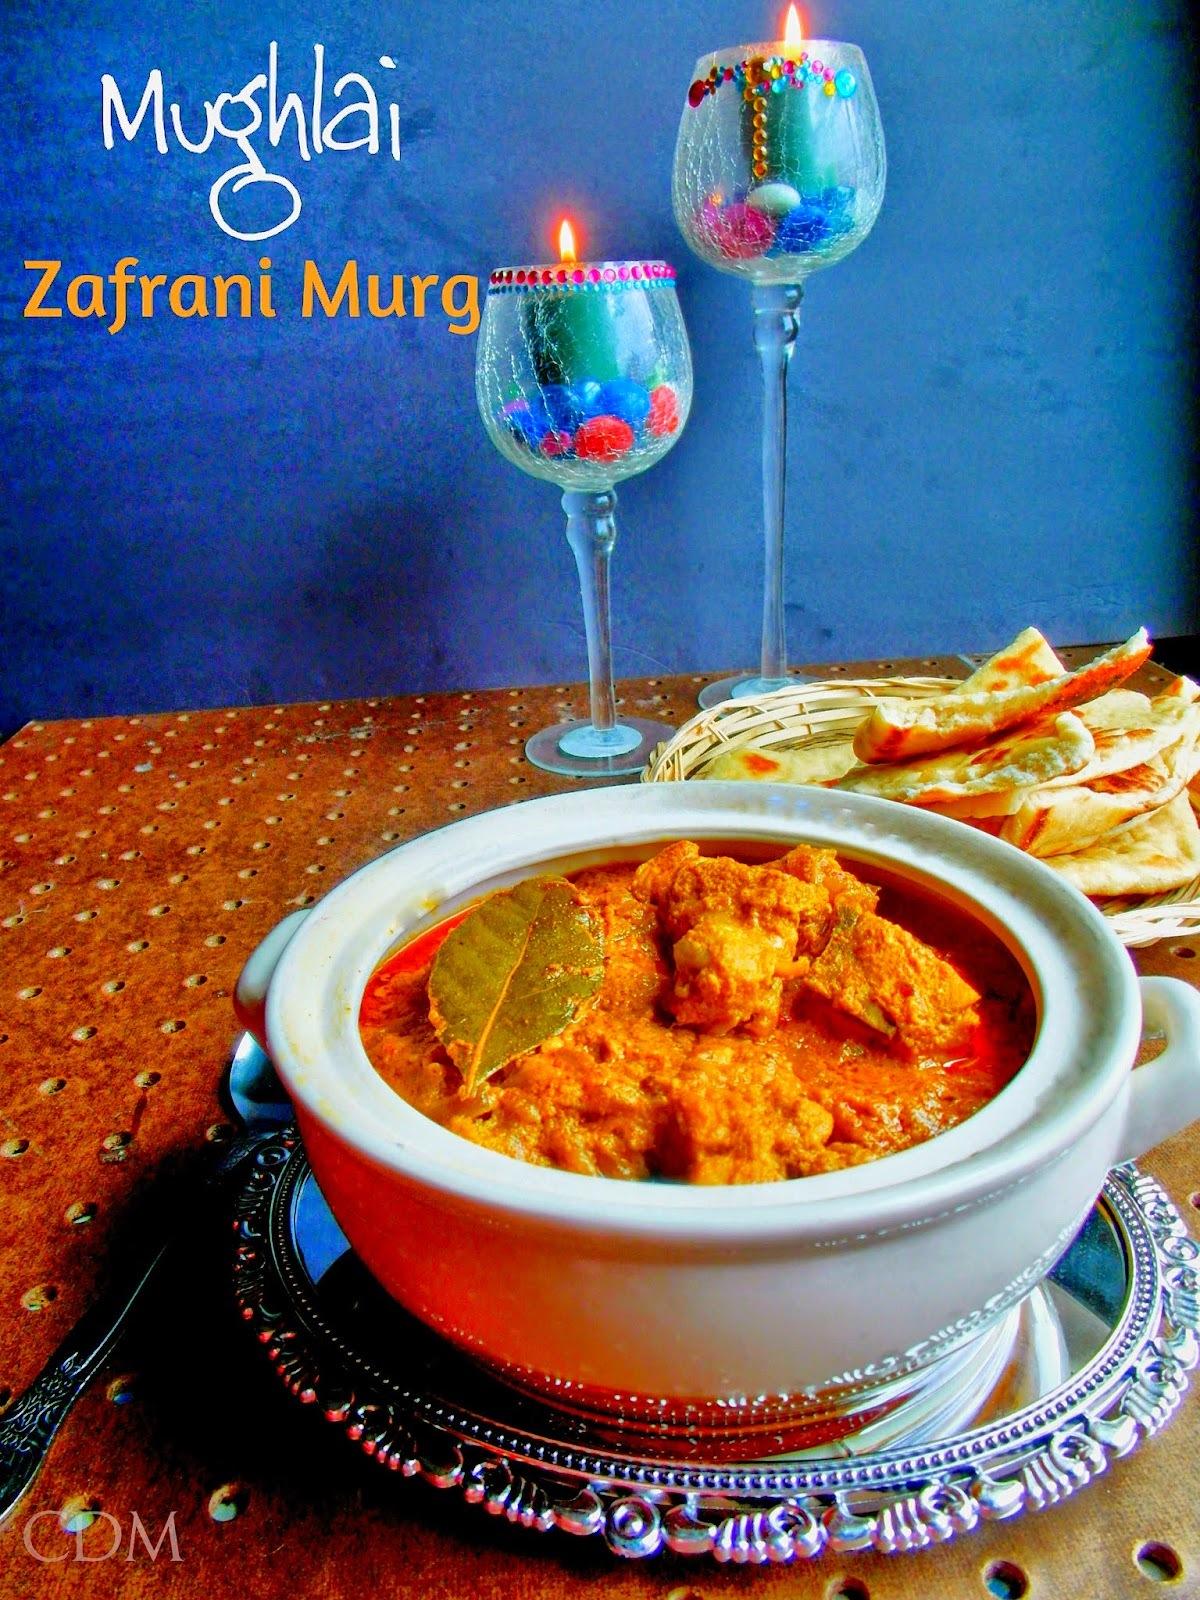 Mughlai Zafrani Murg|A Chicken curry made with saffron and cashewnut paste in Mughlai style